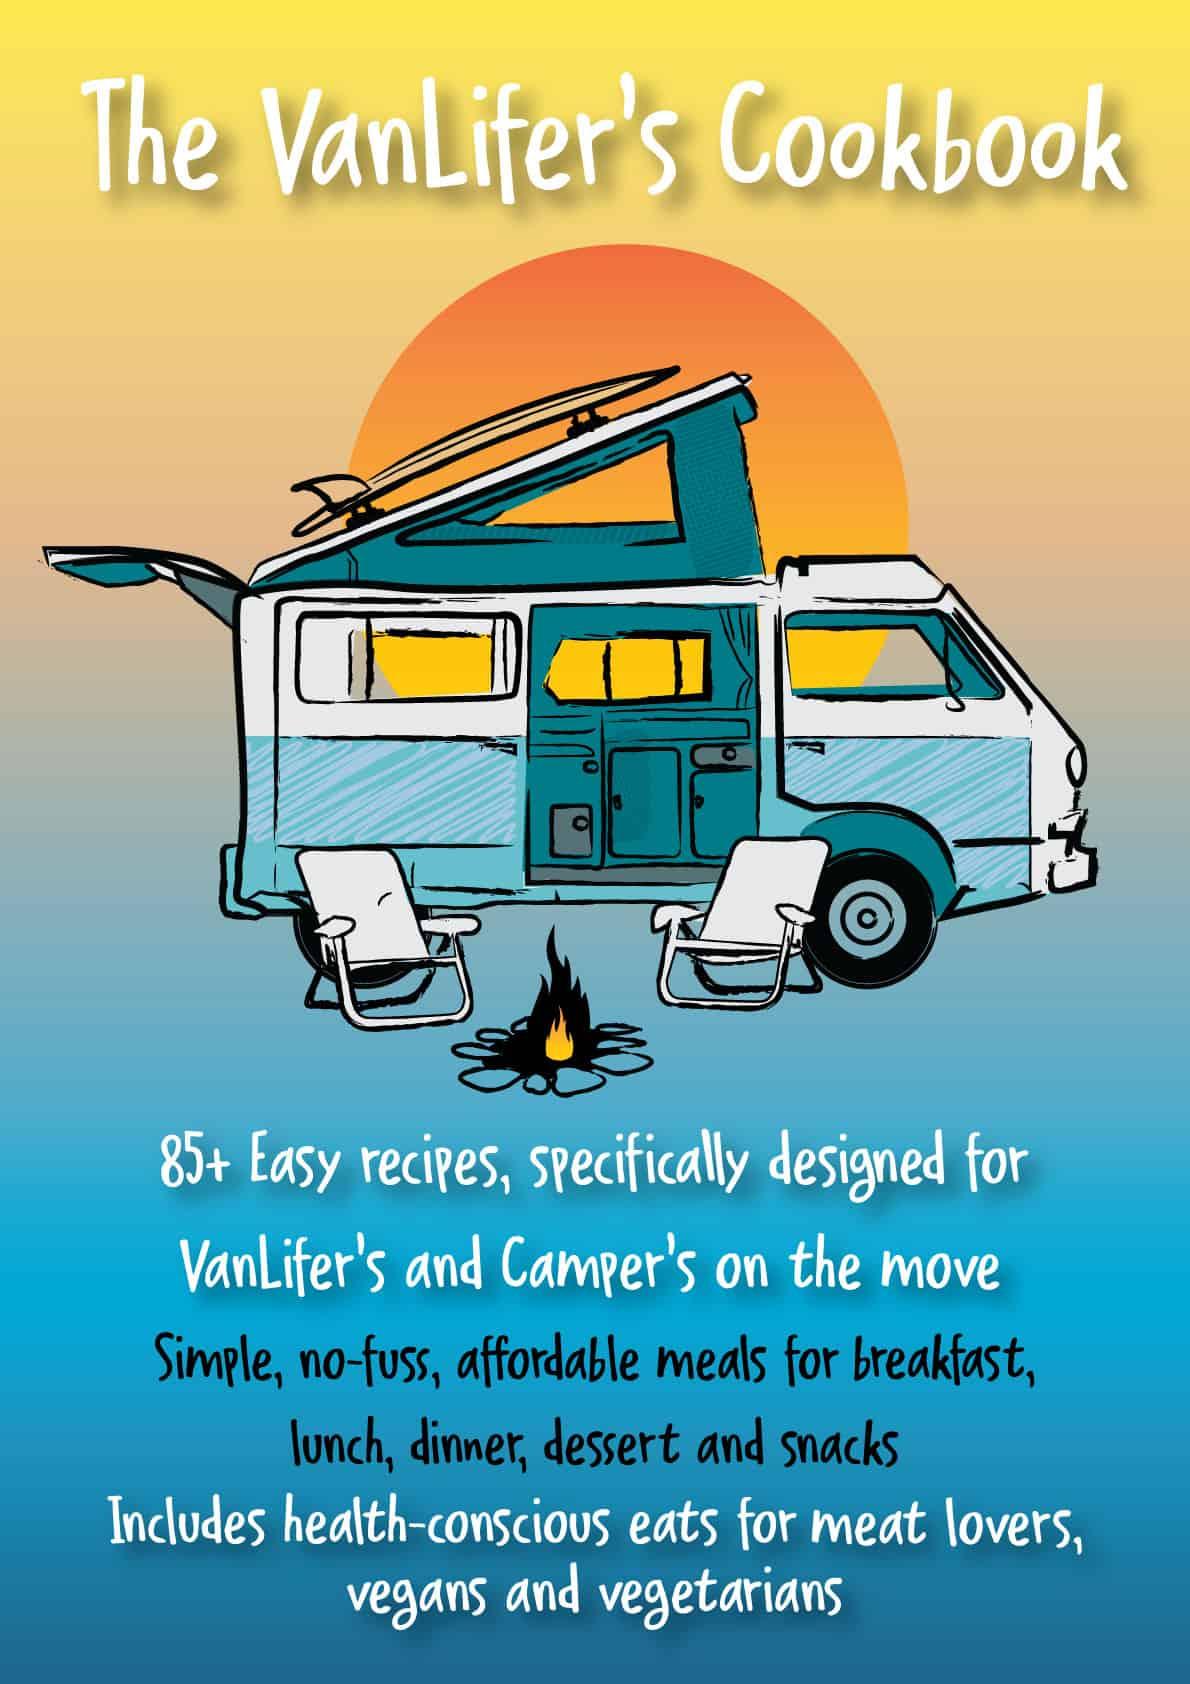 The VanLifer's Cookbook